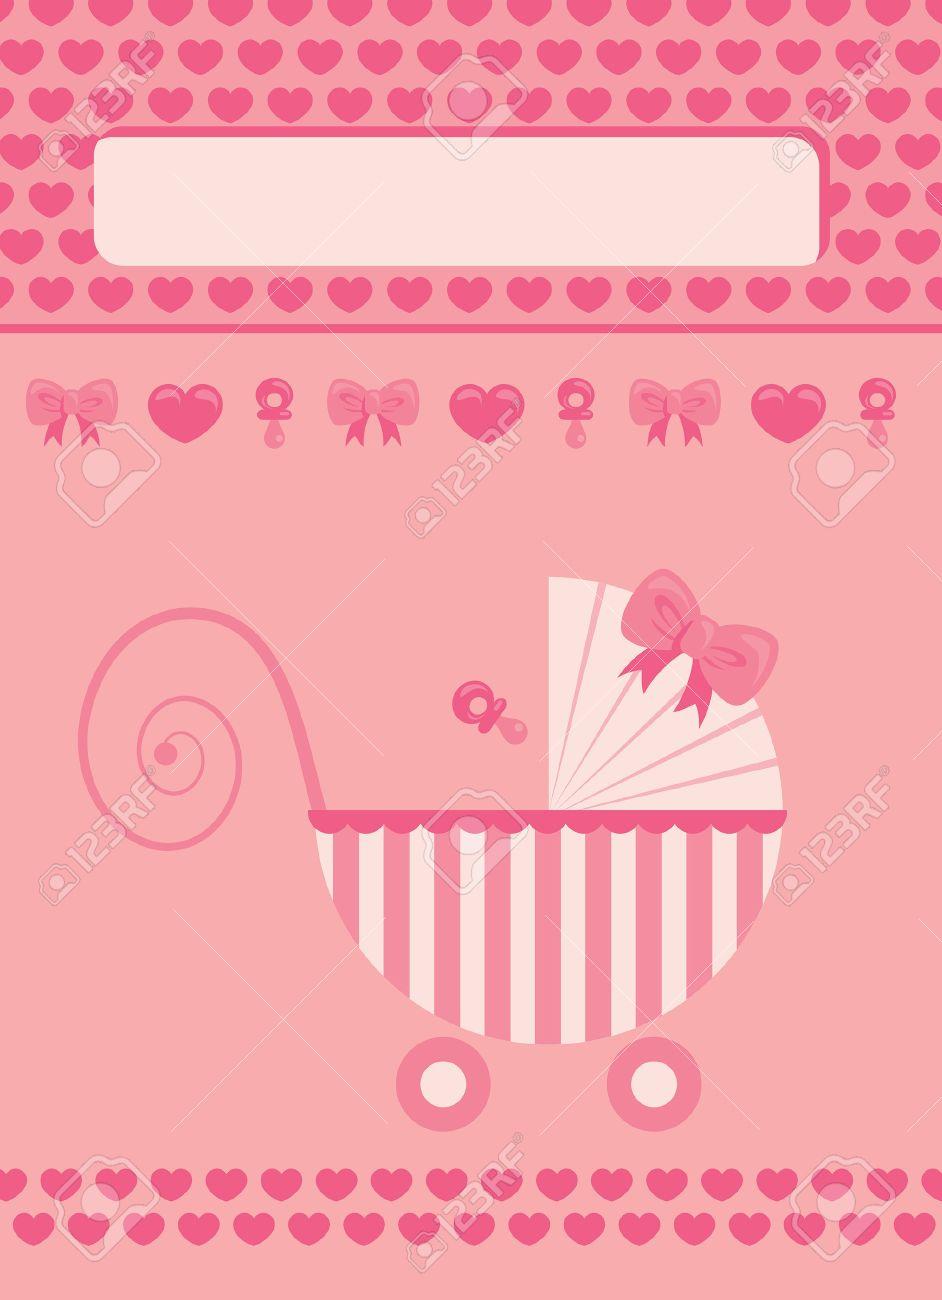 New Born Baby Girl Pink Greeting Card Royalty Free Cliparts Vectors